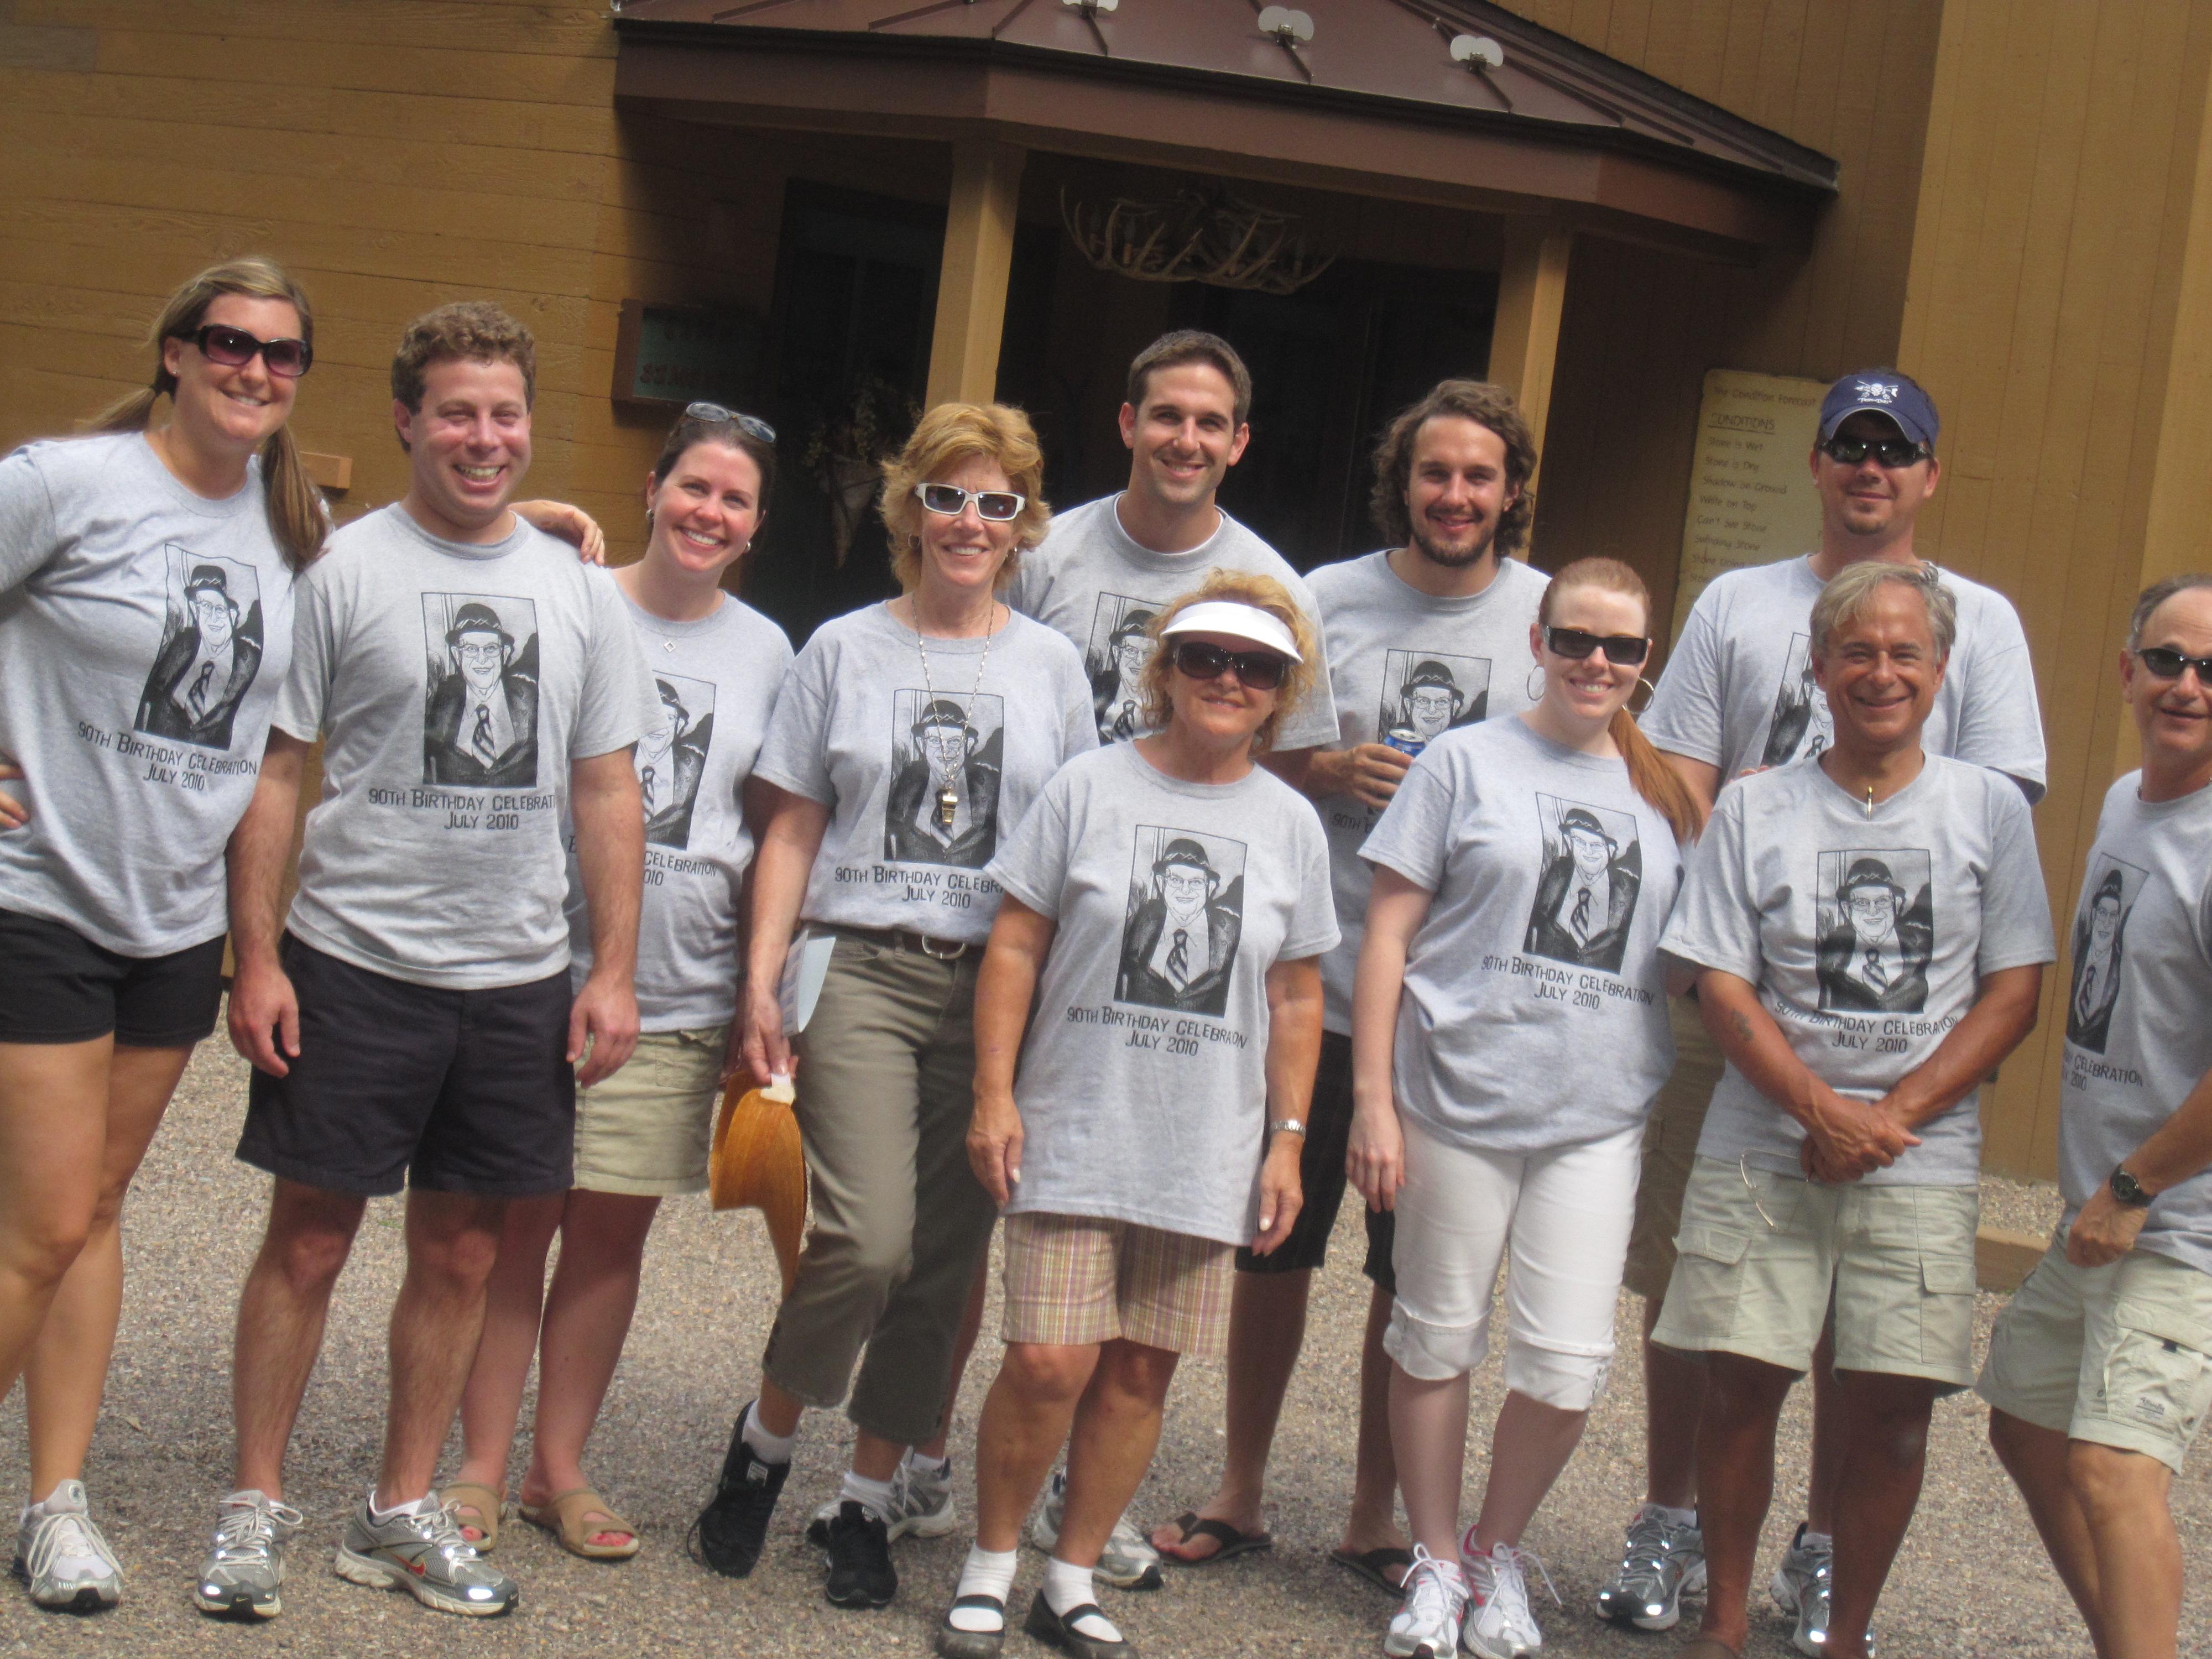 Design your own t-shirt birthday party - 90th Birthday Bash T Shirt Photo